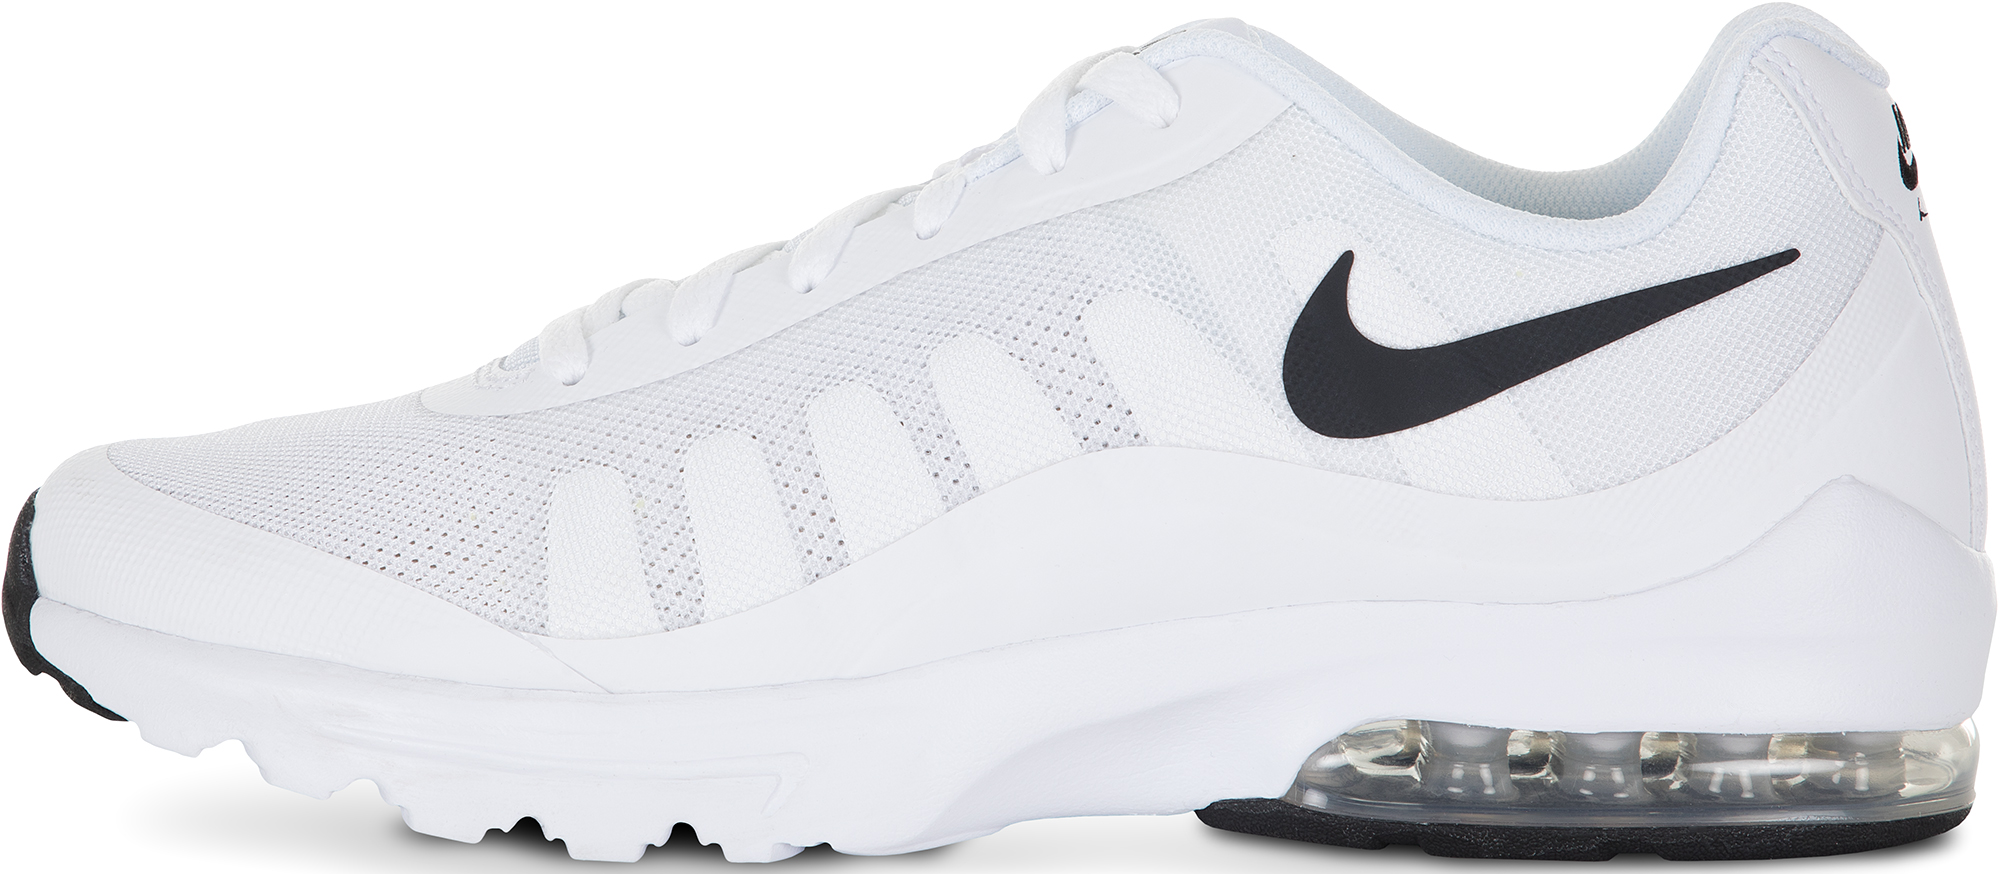 Nike Кроссовки мужские Nike Air Max Invigor, размер 45